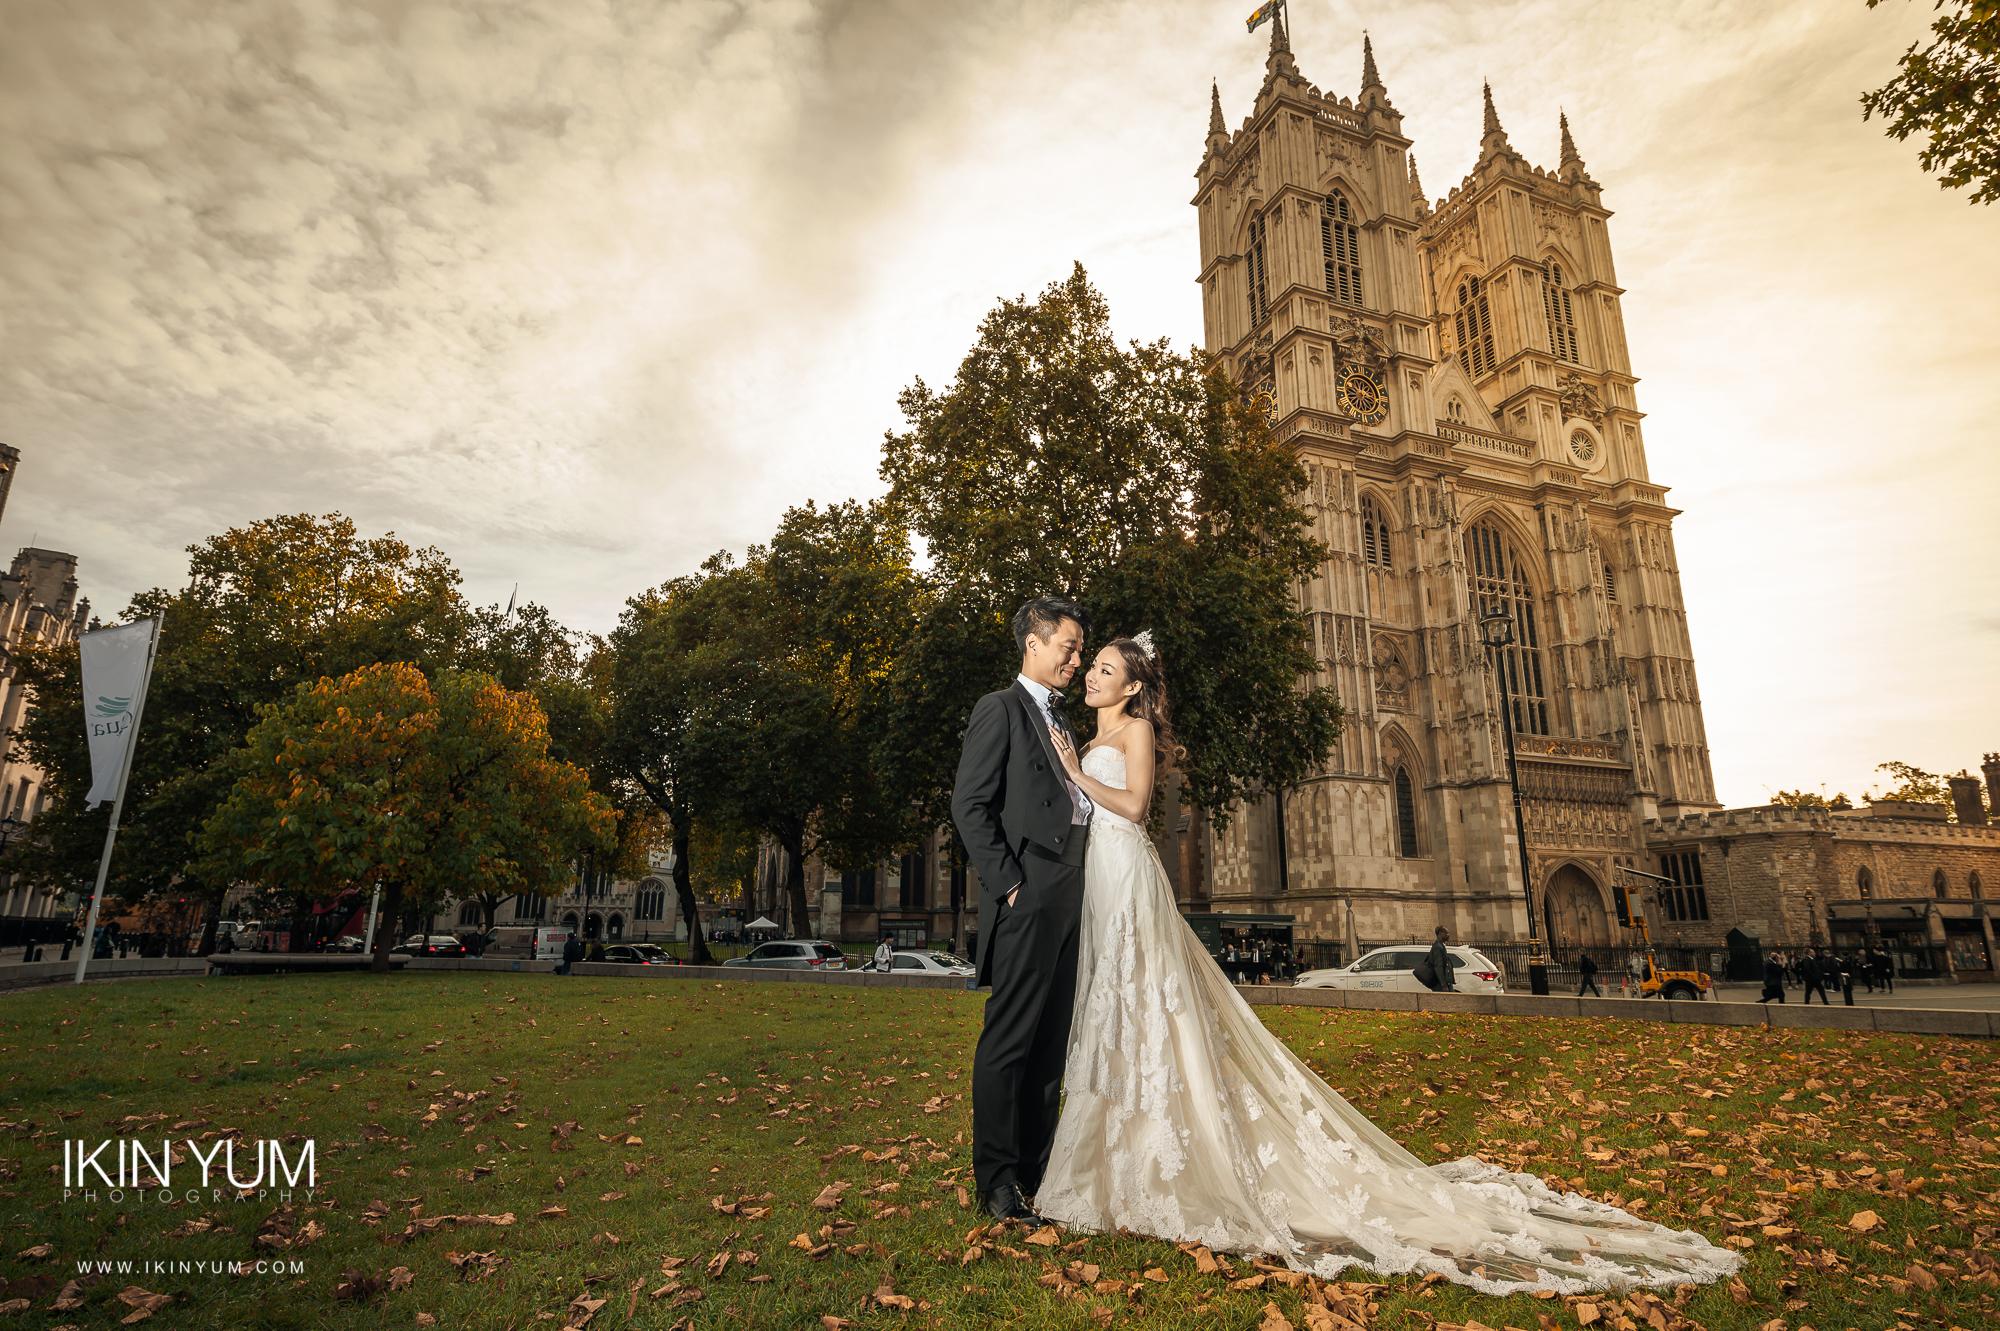 Yannis & Kenny Pre-Wedding Shoot - Ikin Yum Photography-0047.jpg